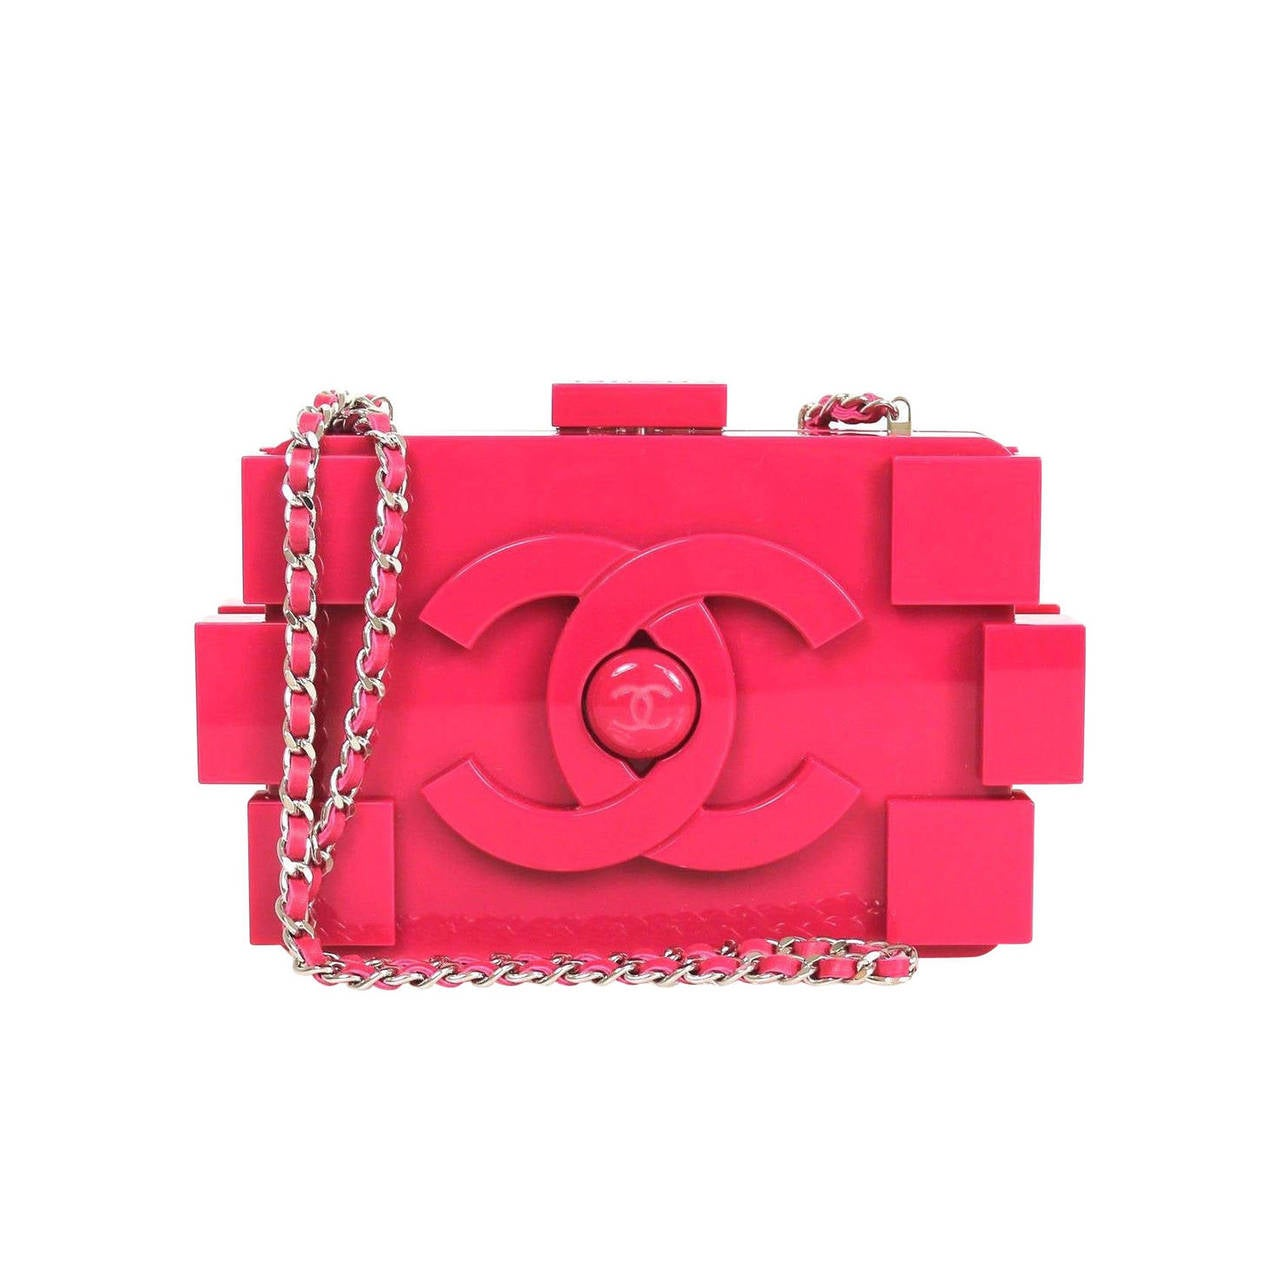 chanel fuschia hot pink plexiglass 2014 lego pink clutch at 1stdibs